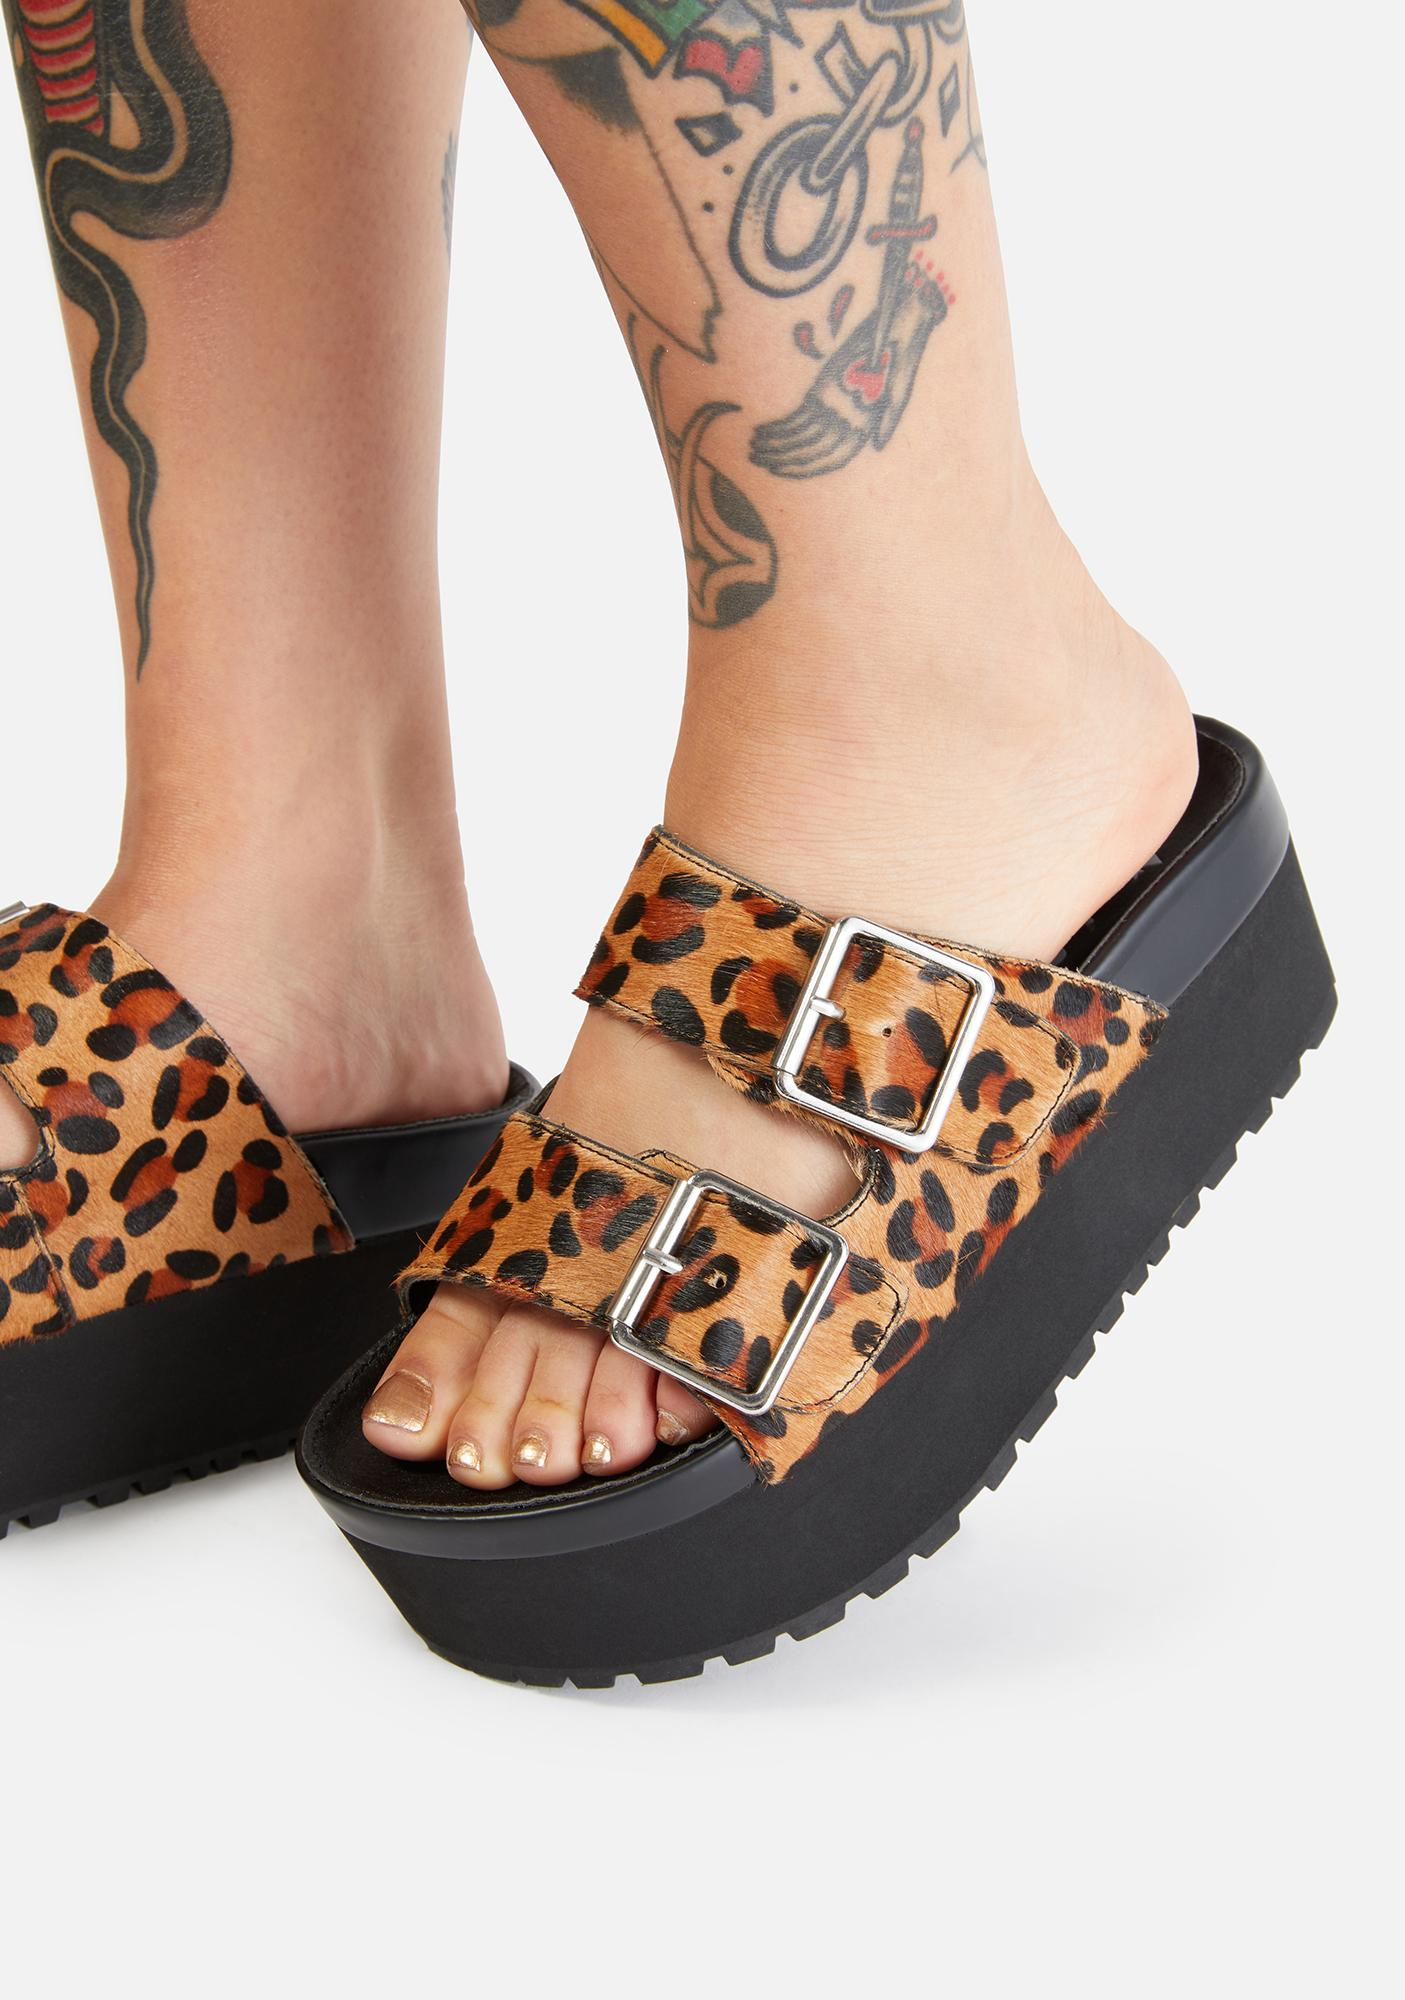 Charla Tedrick Leopard Swagger Platform Slides